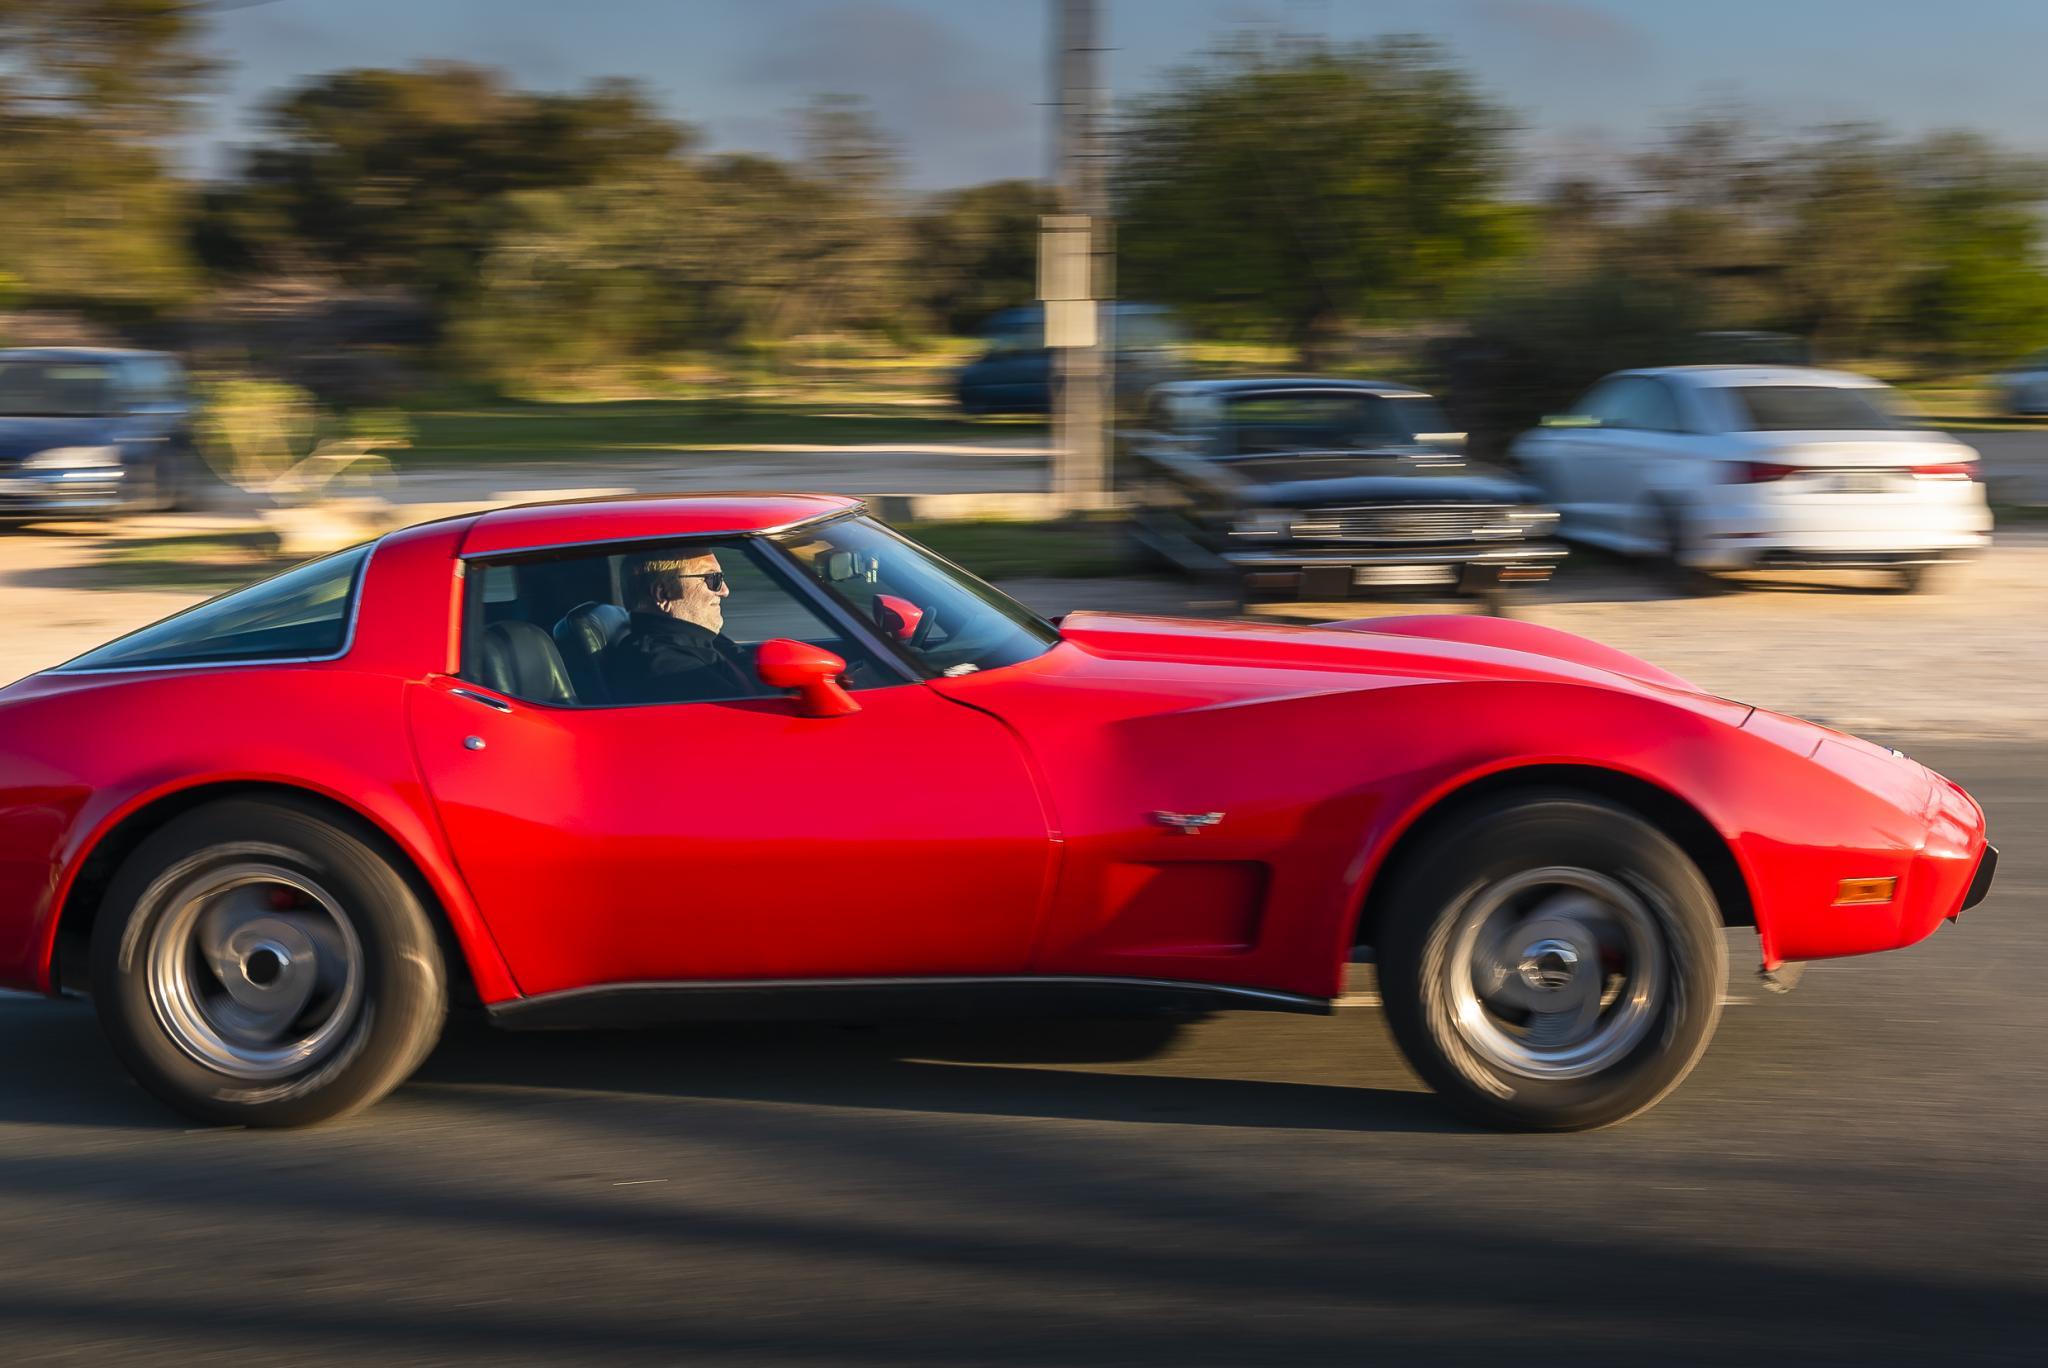 '70's Corvette on take off